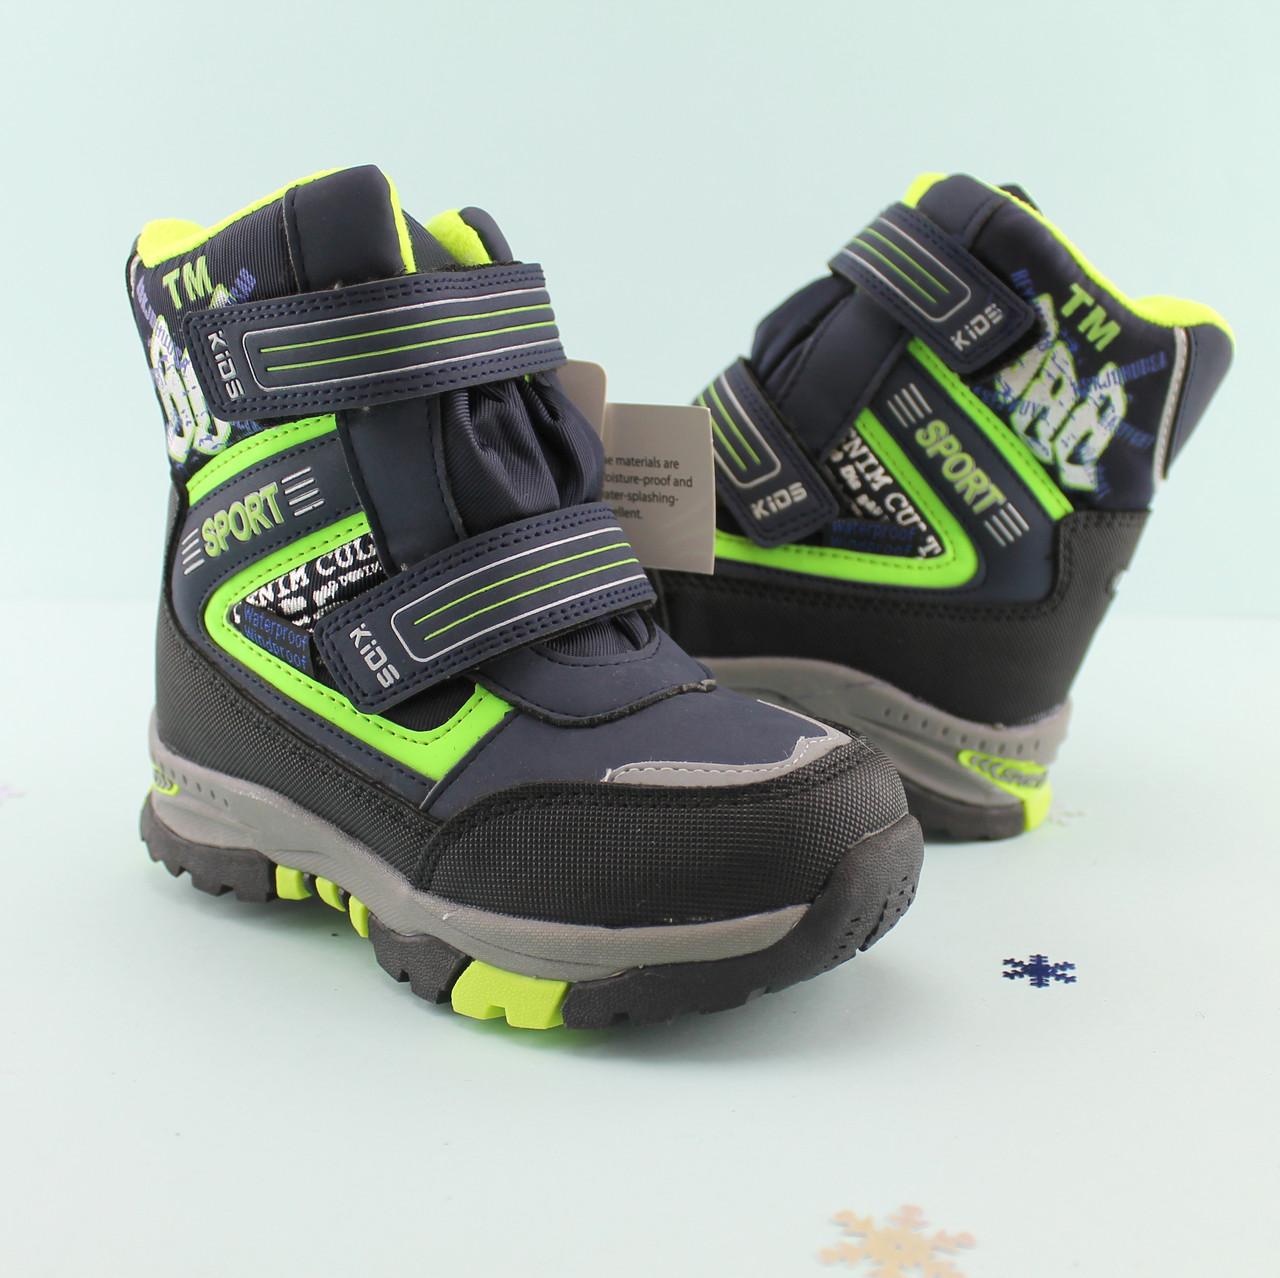 4fd41a3e6 Детские Термо ботинки Том.м для мальчика на овчине размер 27 - Style-Baby